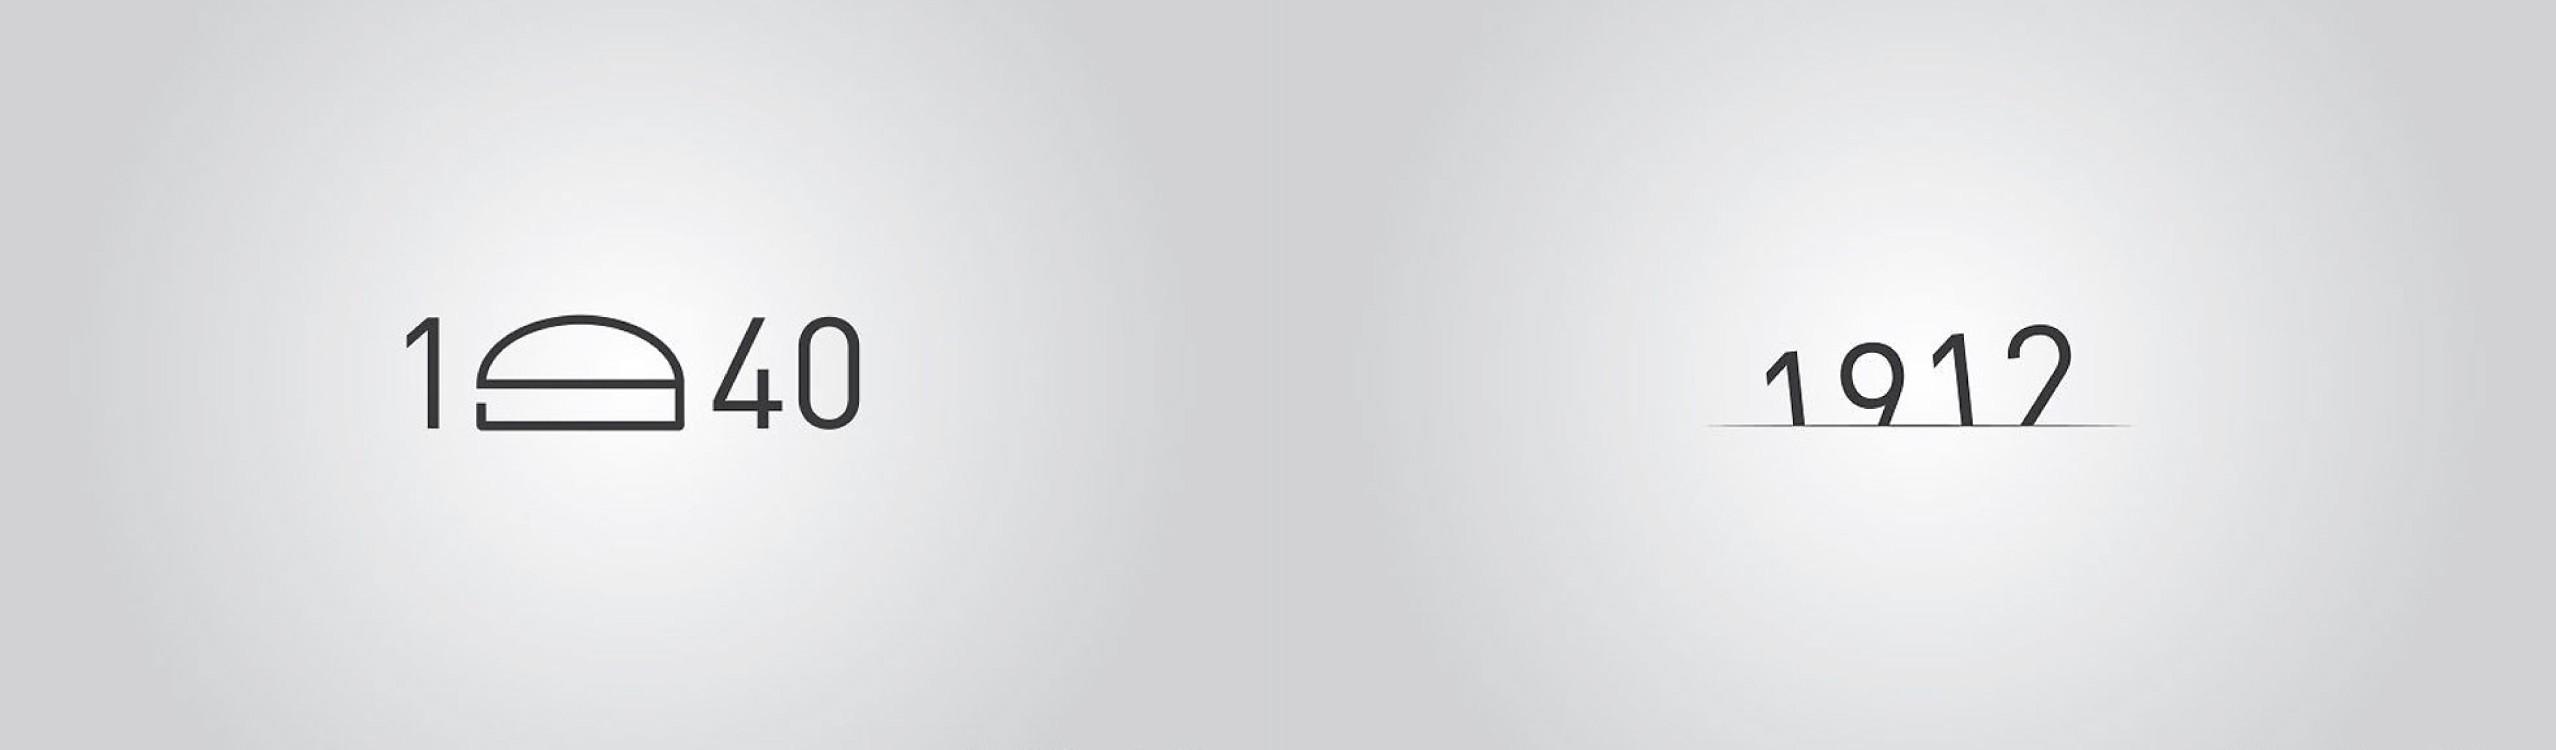 fechas-ilustradas-mis-gafas-de-pasta-destacado